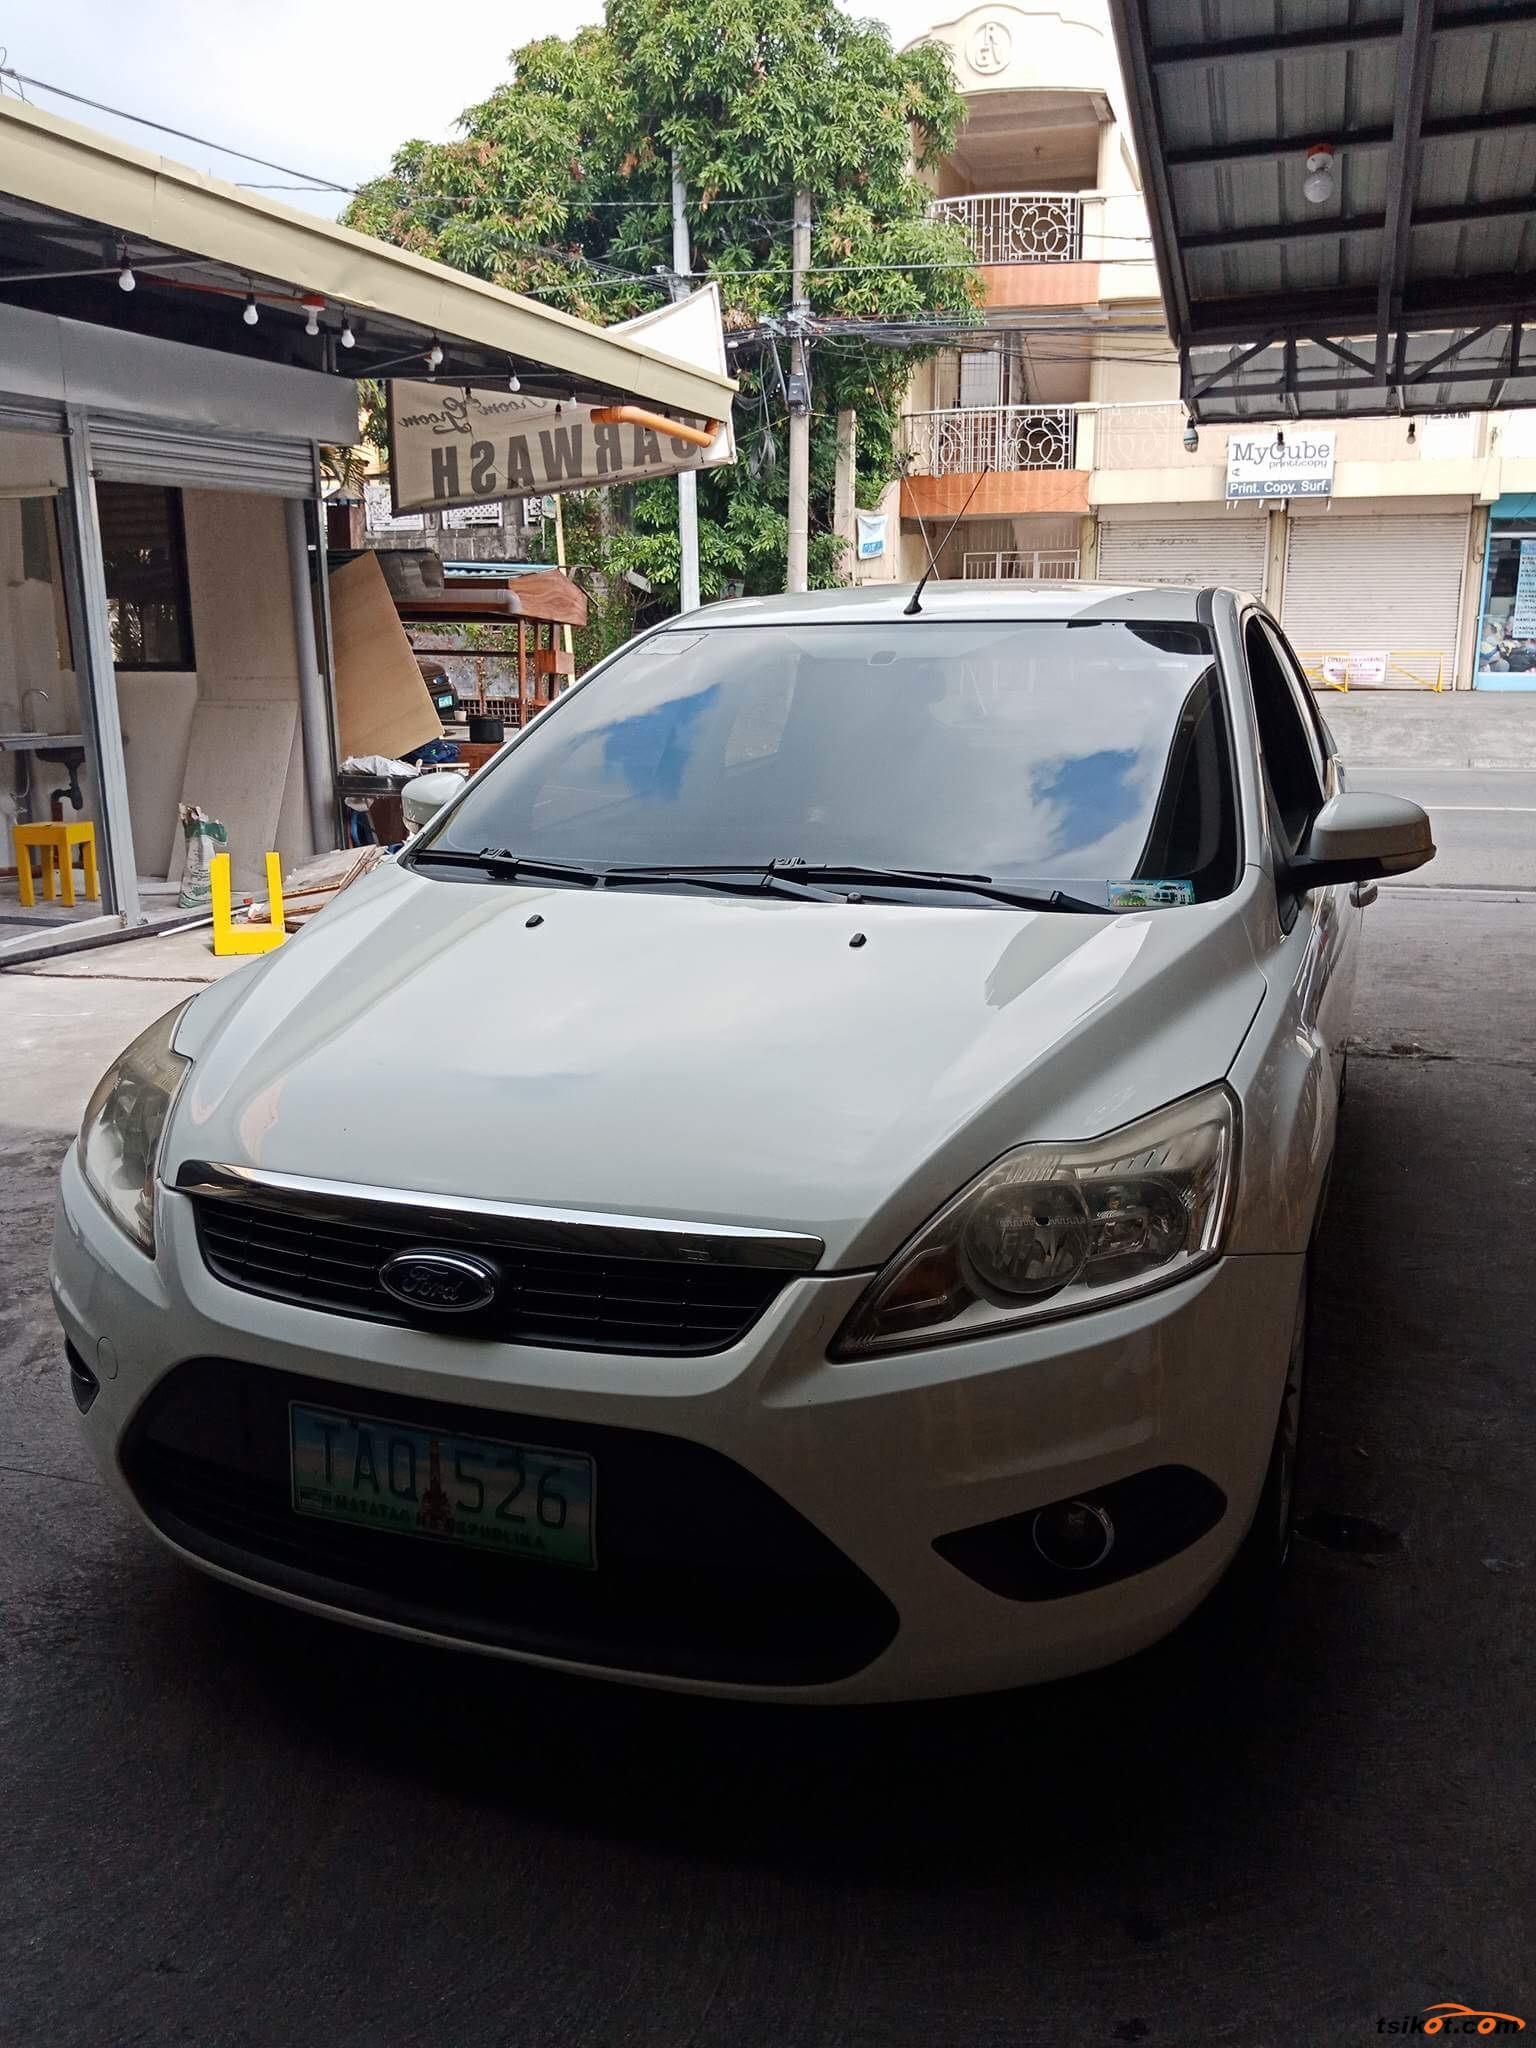 Yokohama Tires Price Philippines >> Ford Focus 2011 - Car for Sale Metro Manila